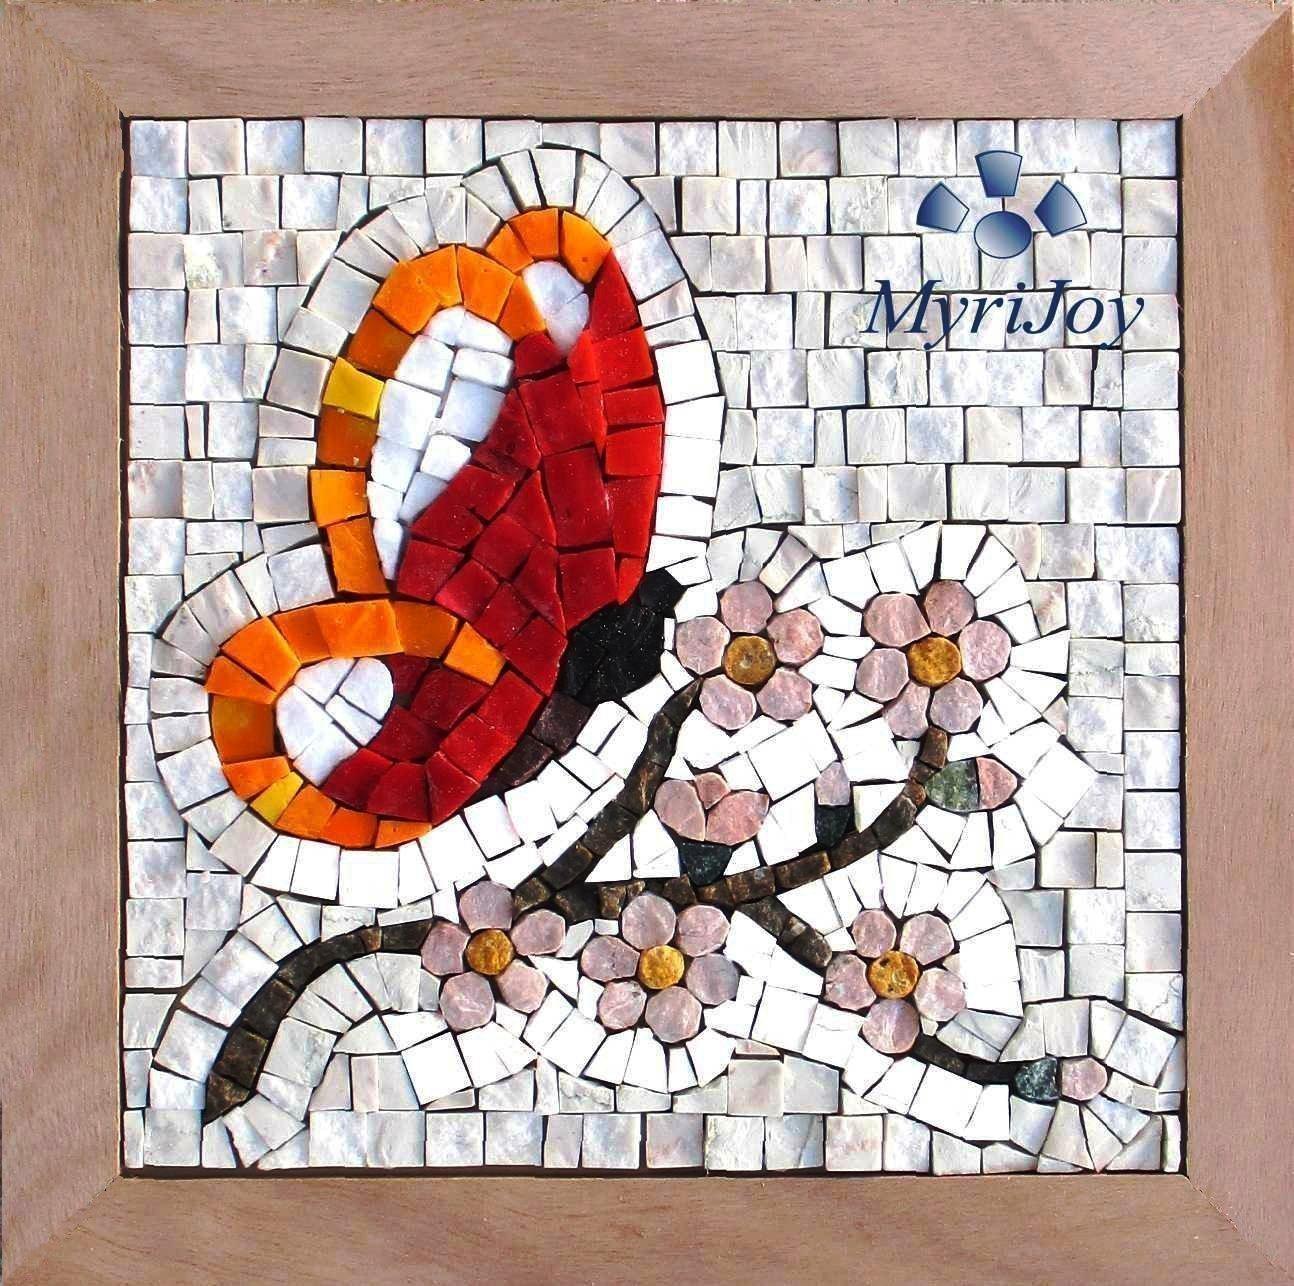 Original gift ideas Mosaic art kit Four Seasons Spring 9''x9'' / Italian marble mosaic tiles & Murano glass mosaic tiles/Mosaic supplies/Arts and crafts for adults/Mosaic making kit